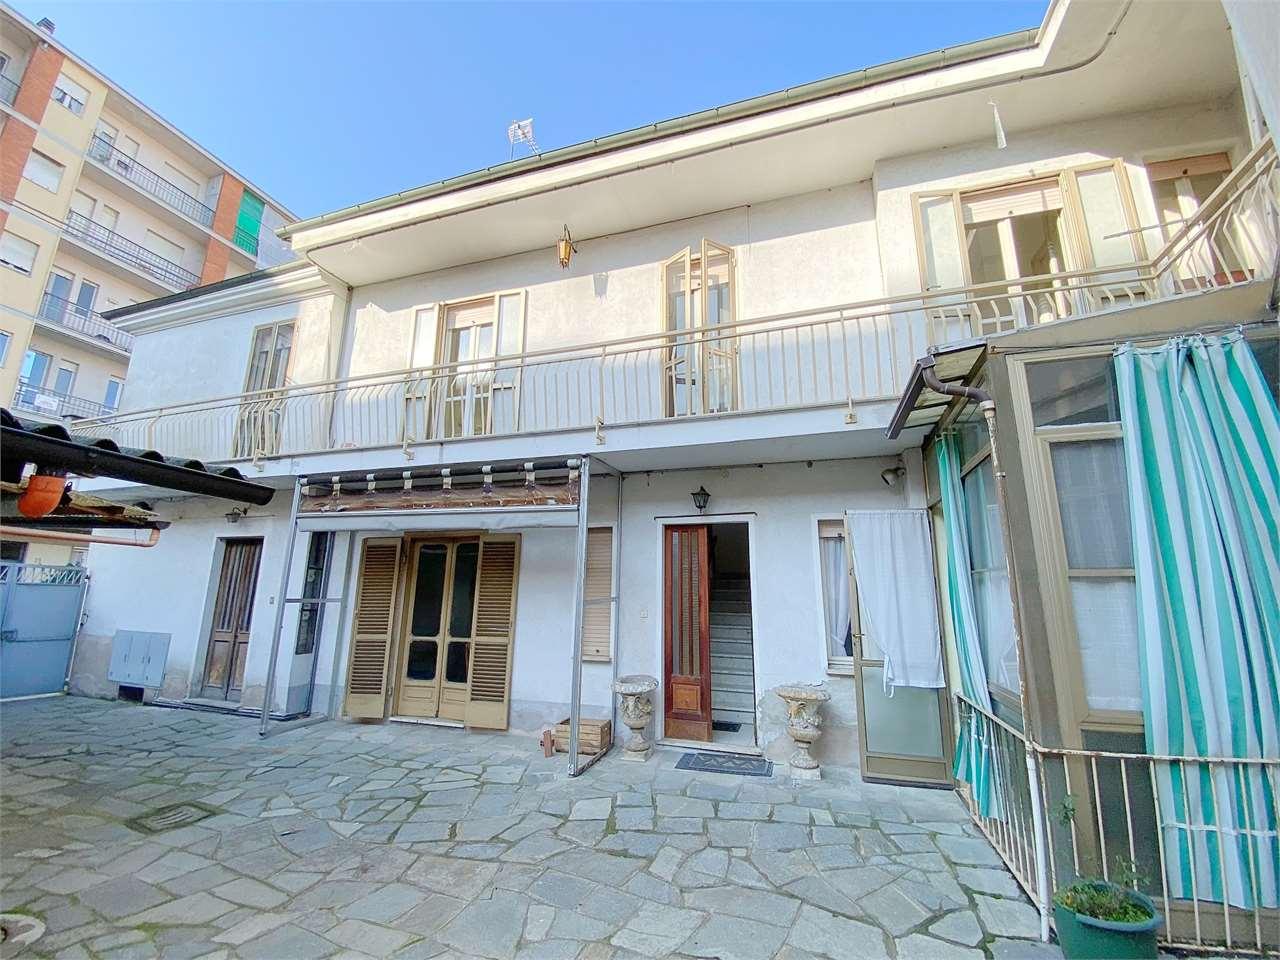 Vendita Casa Indipendente Casa/Villa Chieri 243364